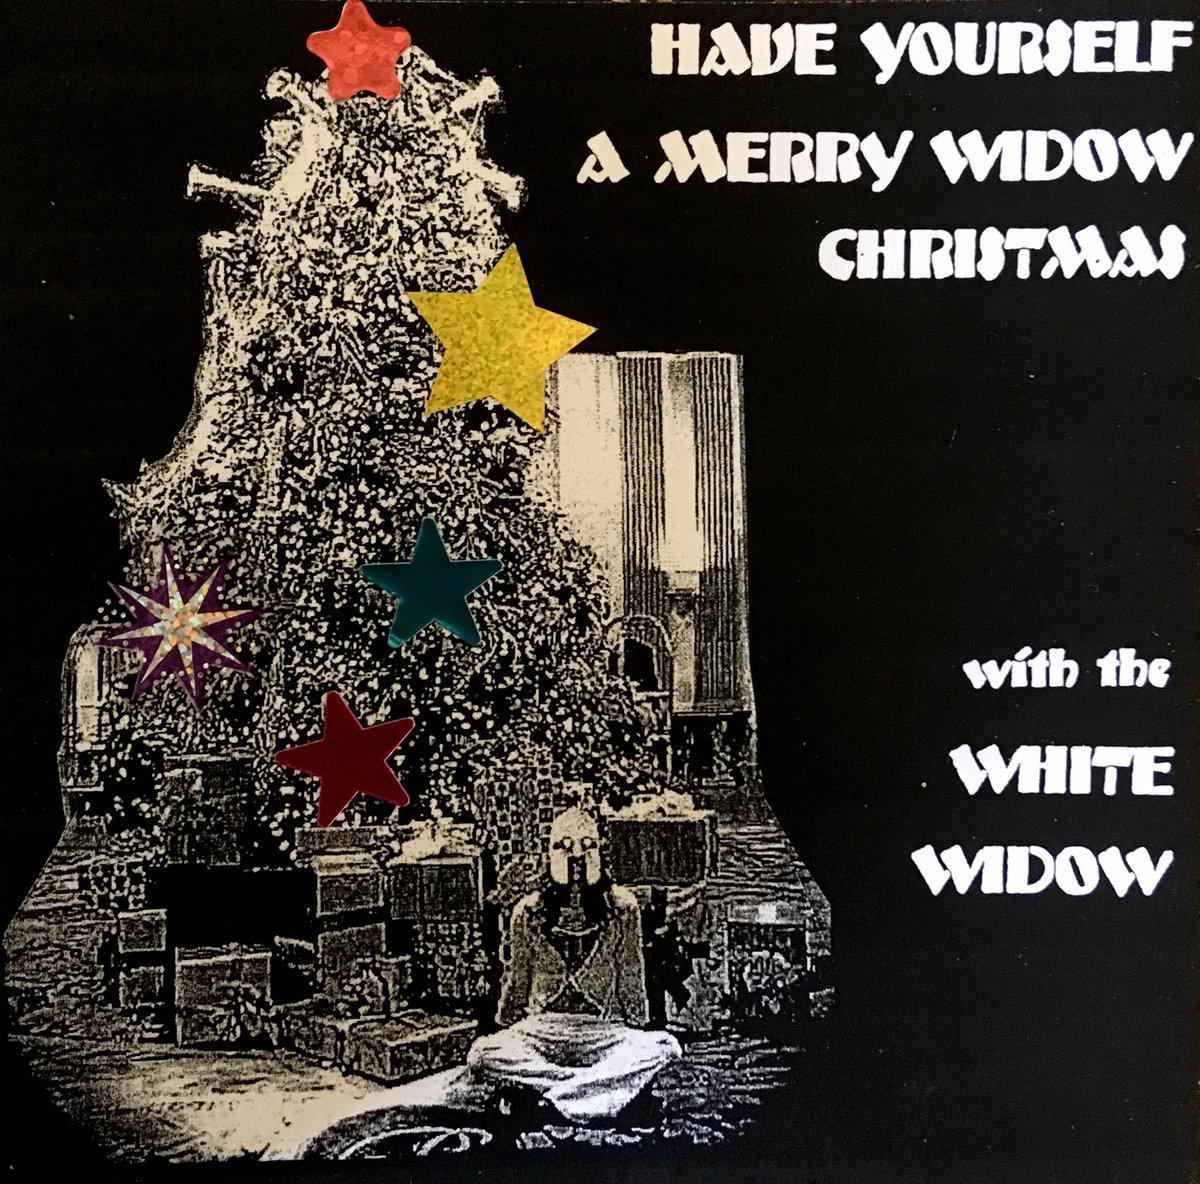 By White Widow III